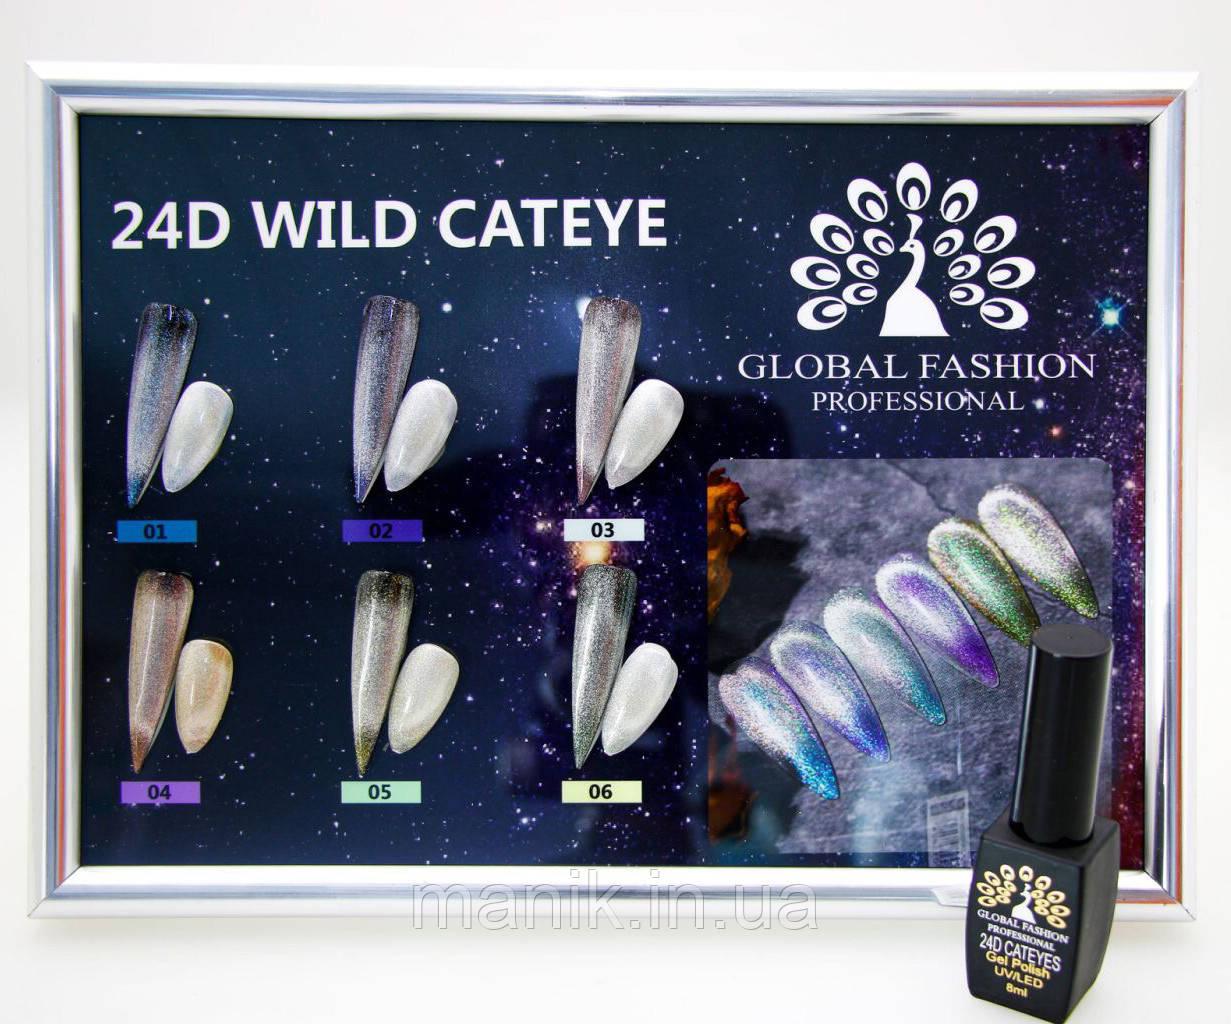 Гель лак кошачий глаз Global 24D Wild Cateye